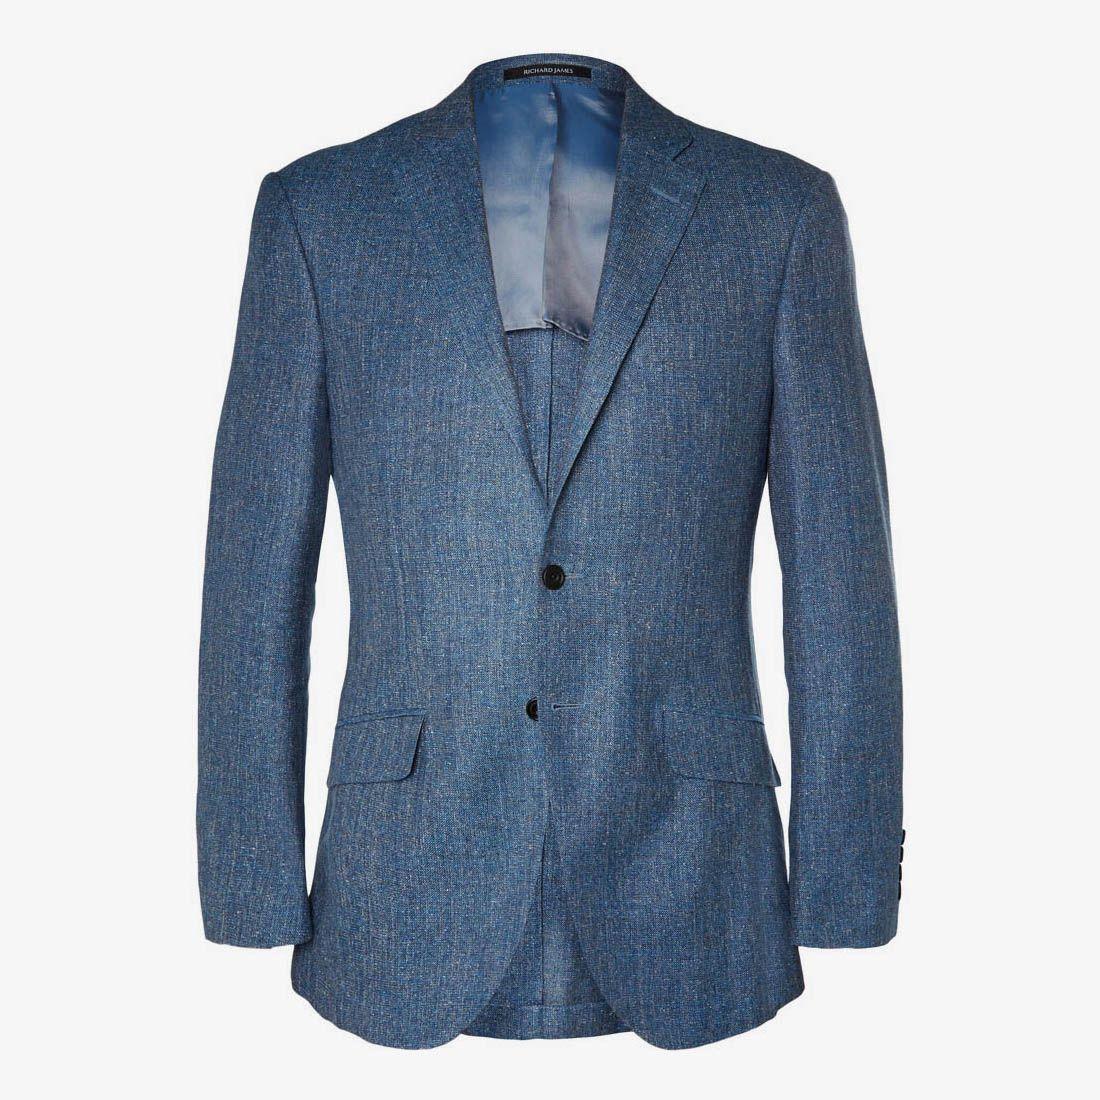 Pick of the Day: Richard James Blue 'Hyde' Jacket - http://www.mnswr.com/pick-of-the-day-richard-james-blue-hyde-jacket/ Menswear style inspiration    #menswear #mensfashion #mensstyle #style #sprezzatura #sprezza #mentrend #menwithstyle #gentlemen #bespoke #mnswr #sartorial #mens #dapper